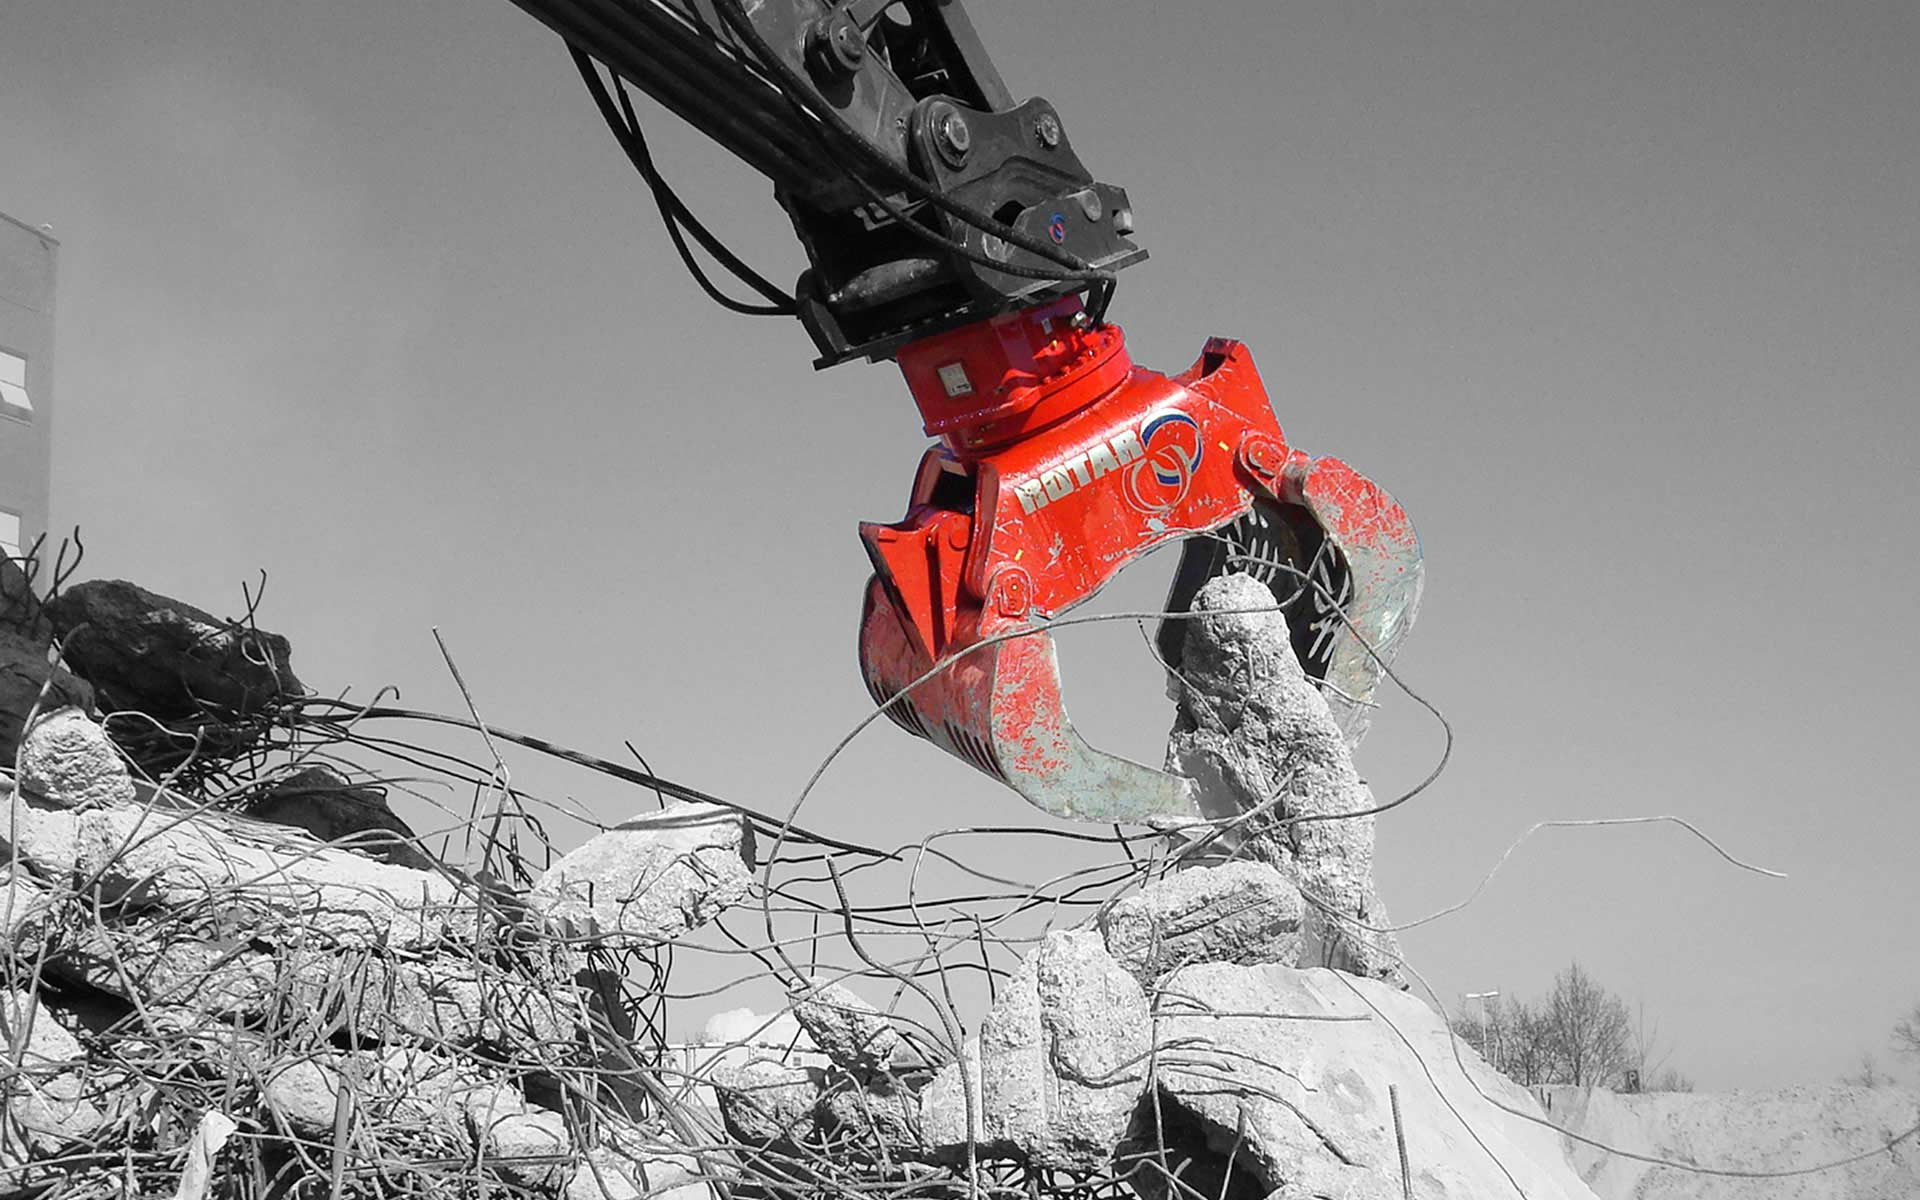 Demolition or Sorting Grab